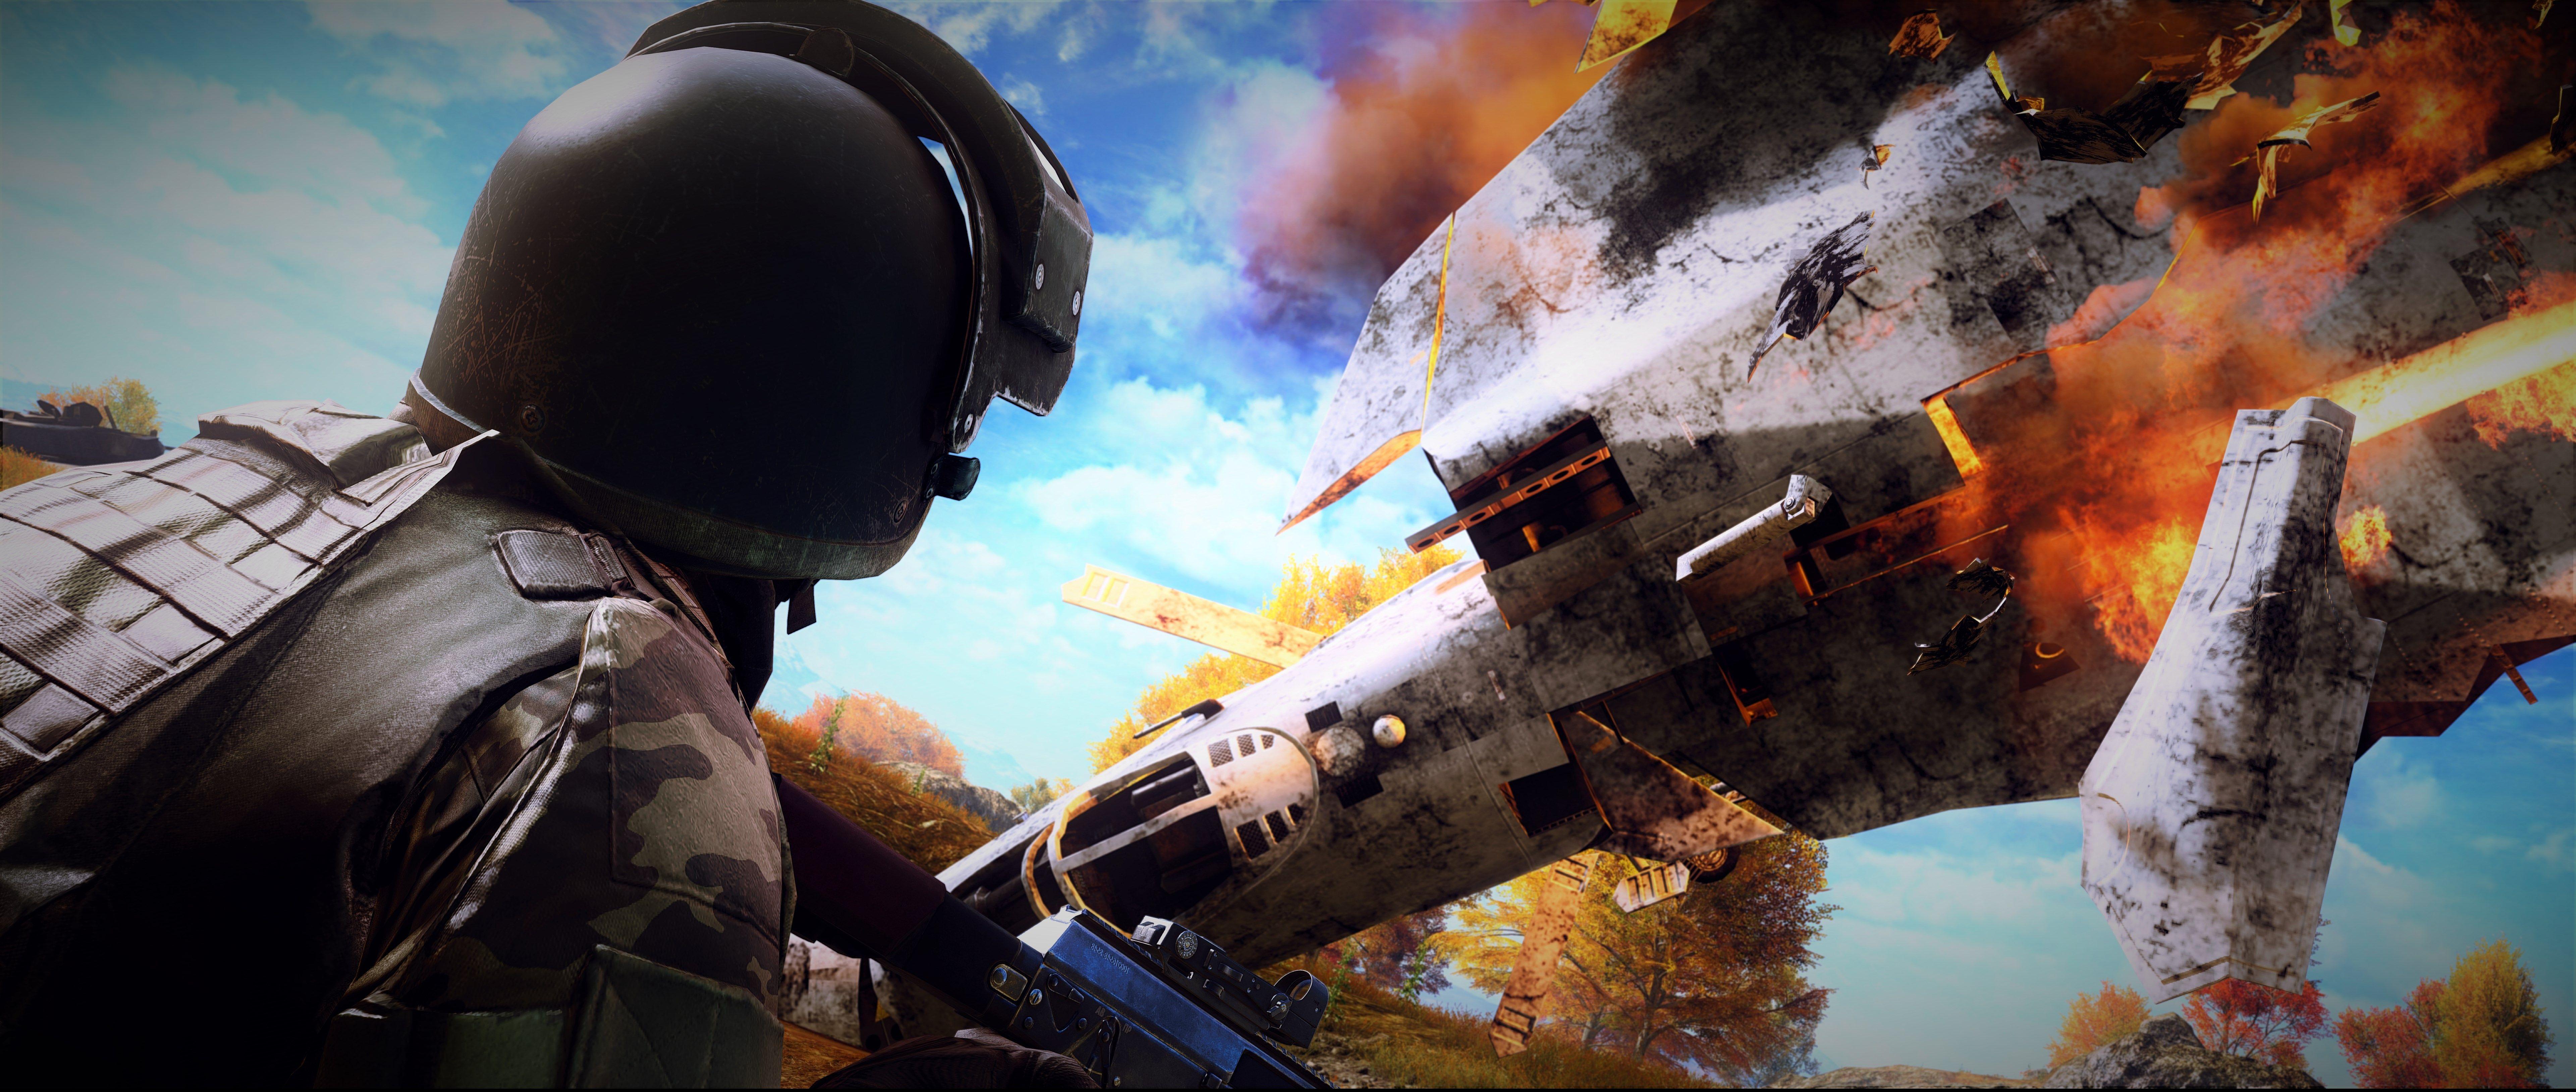 Battlefield 4 Pic